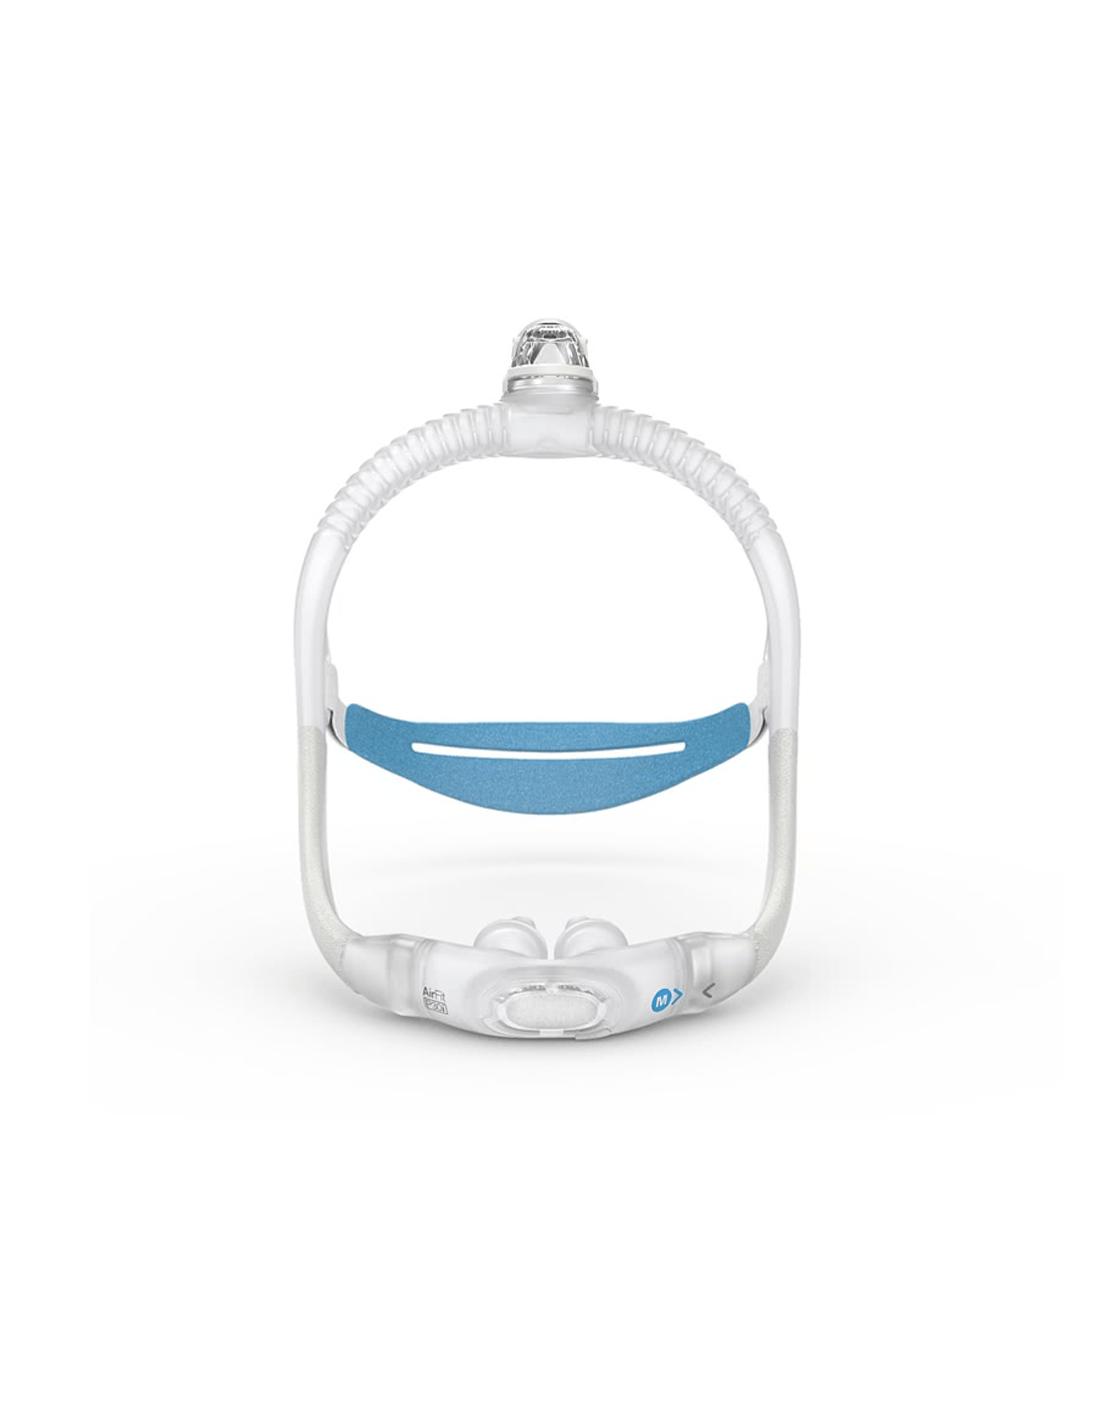 resmed airfit p30i nasal pillow mask